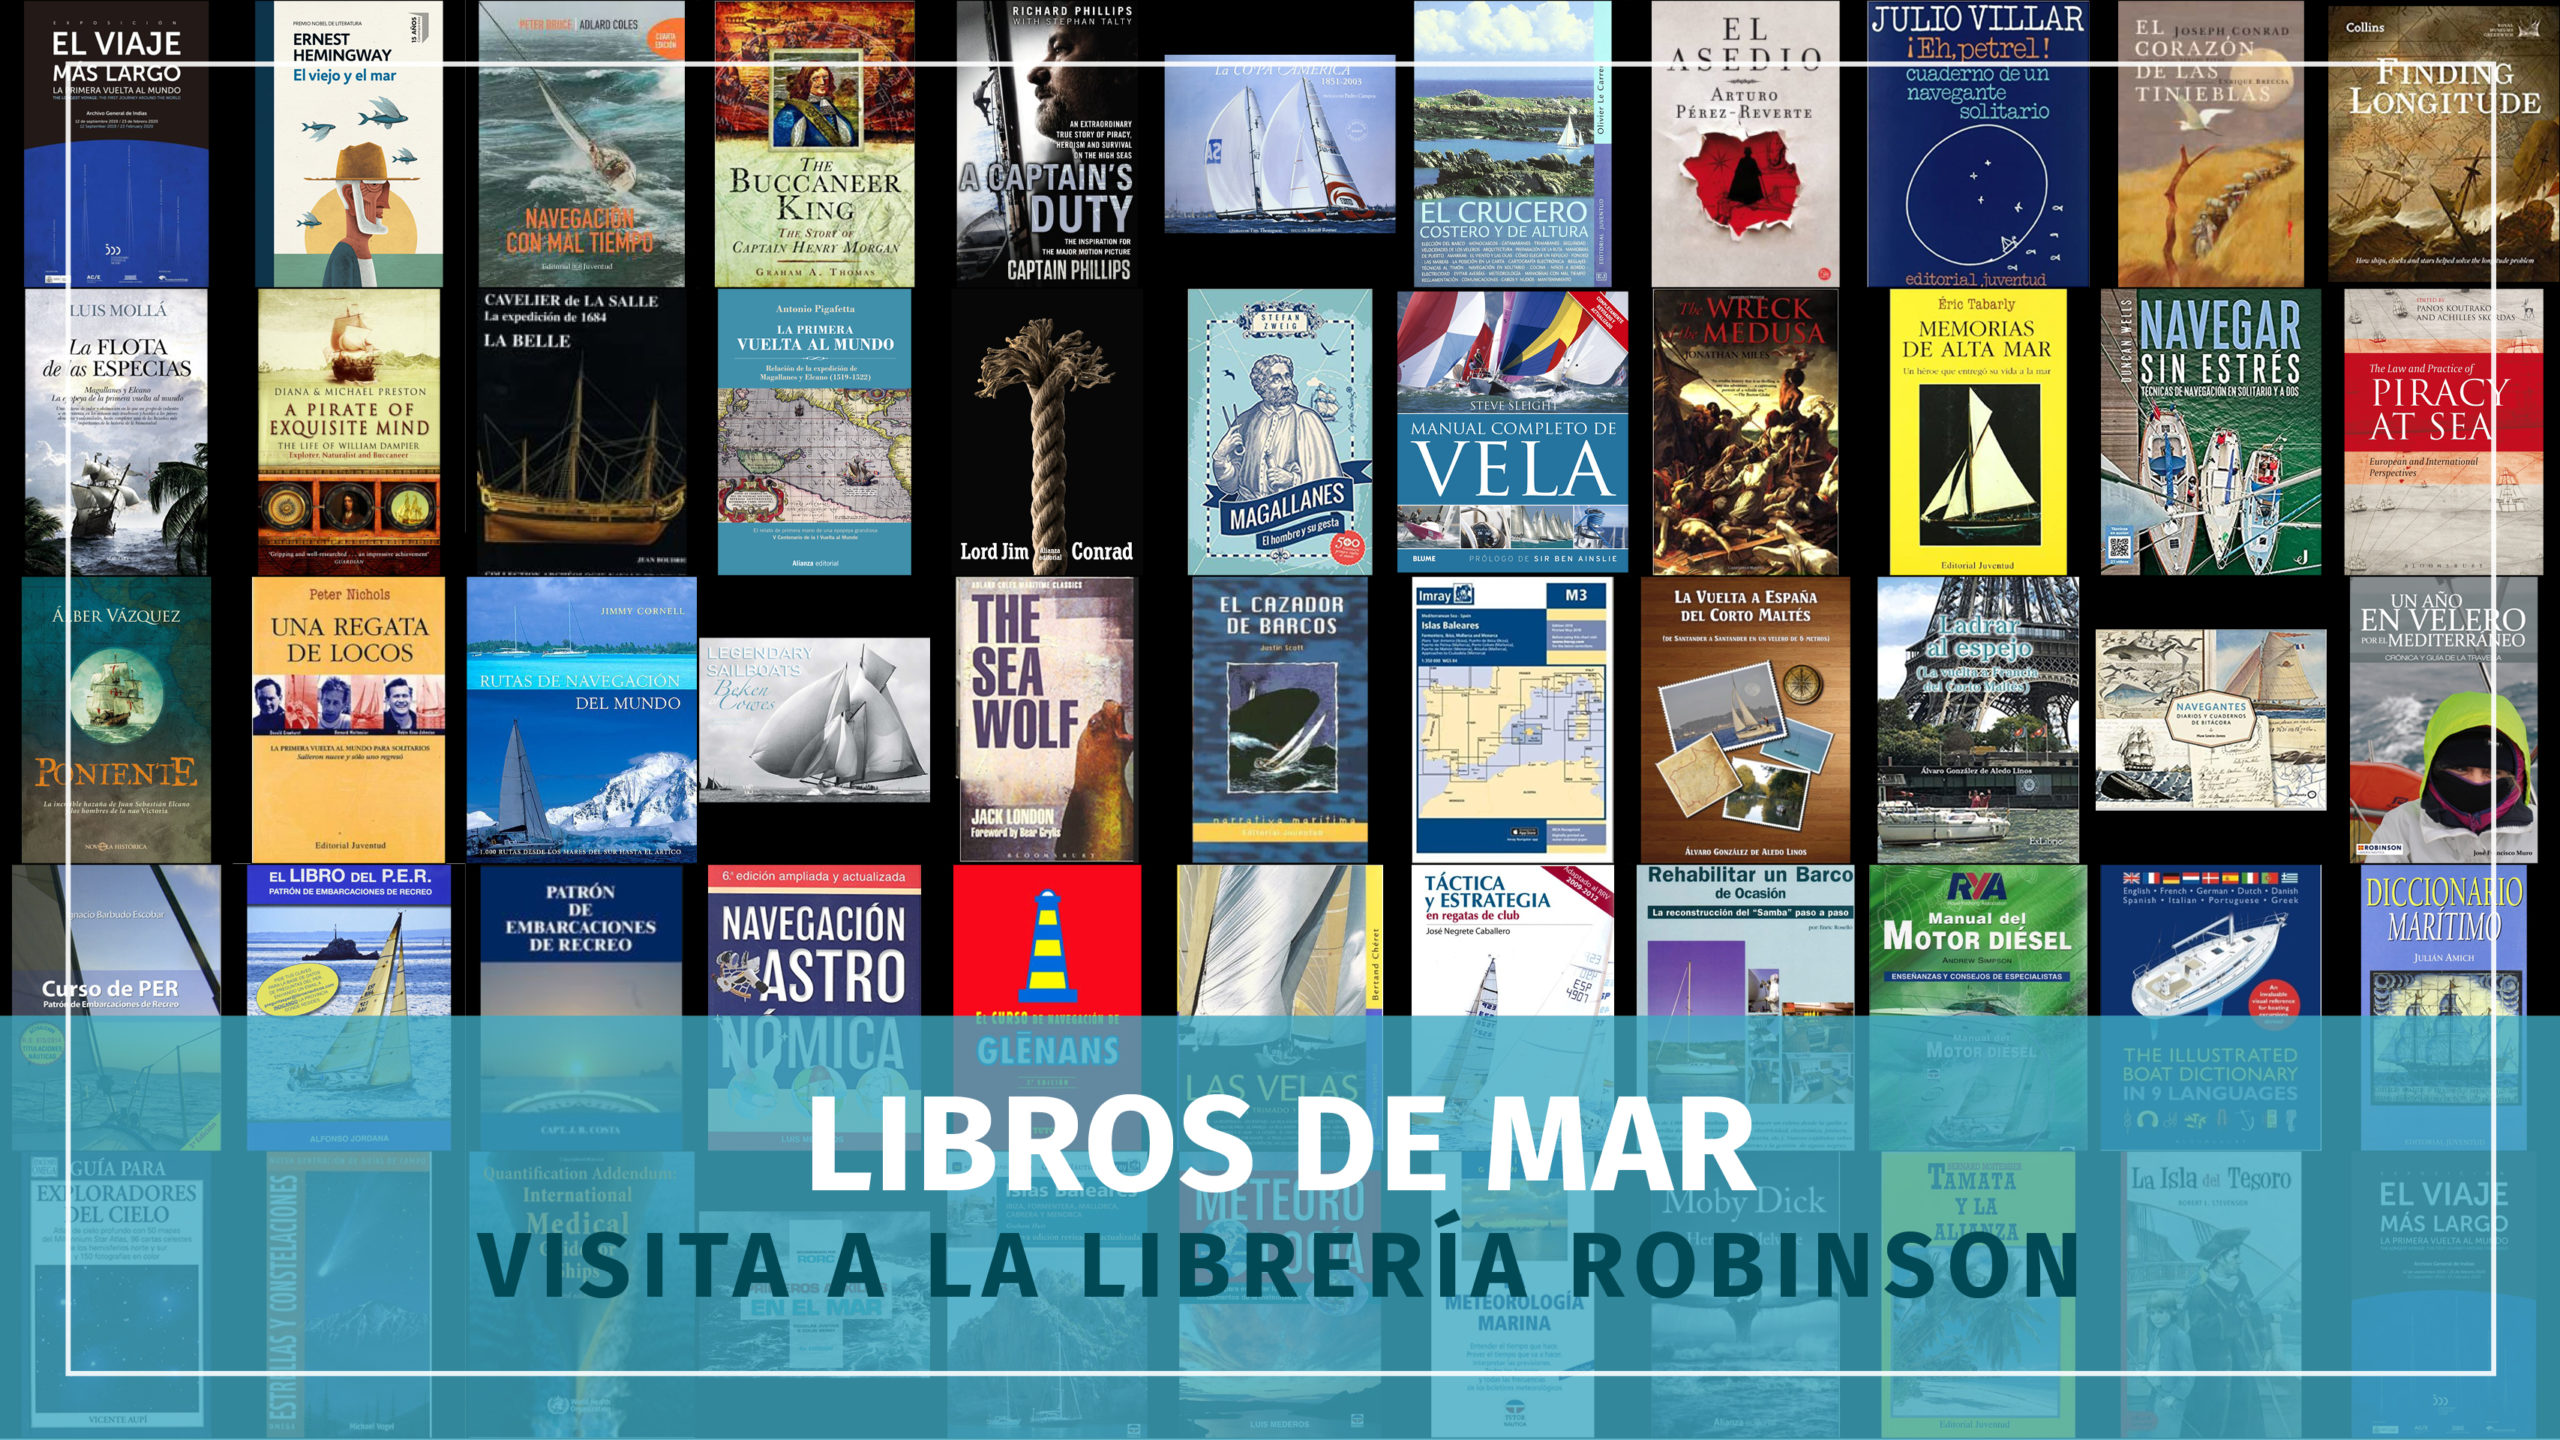 Libros De Mar-Nautica-Veleros